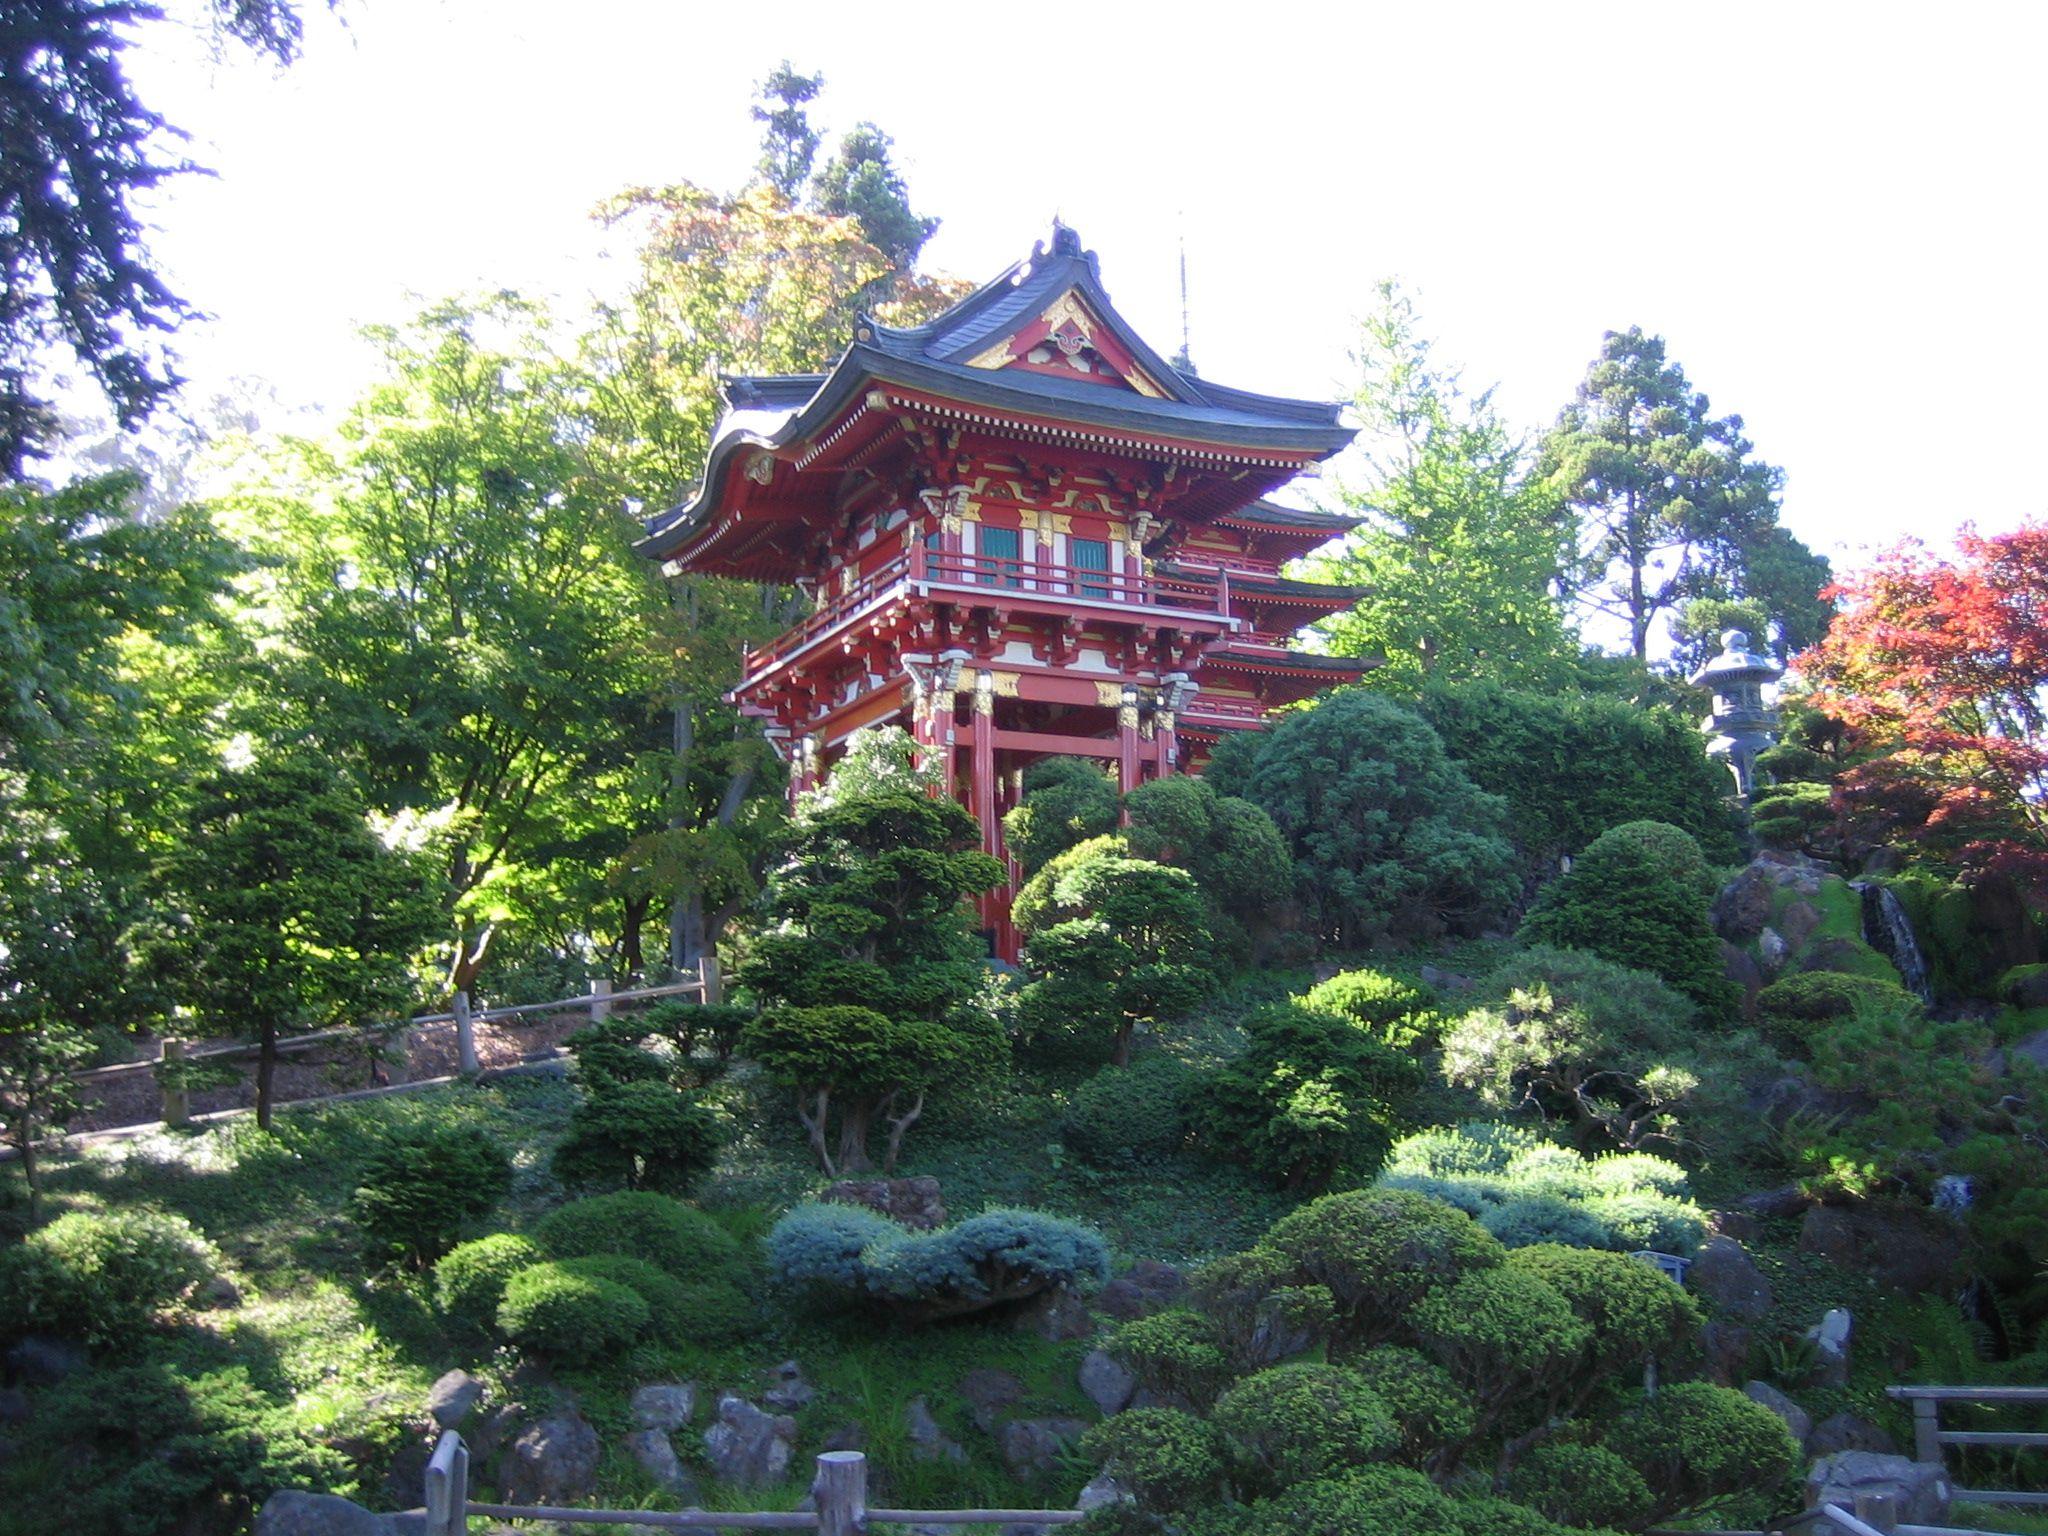 Japanese Tea Garden in Golden Gate Park, San Francisco, CA